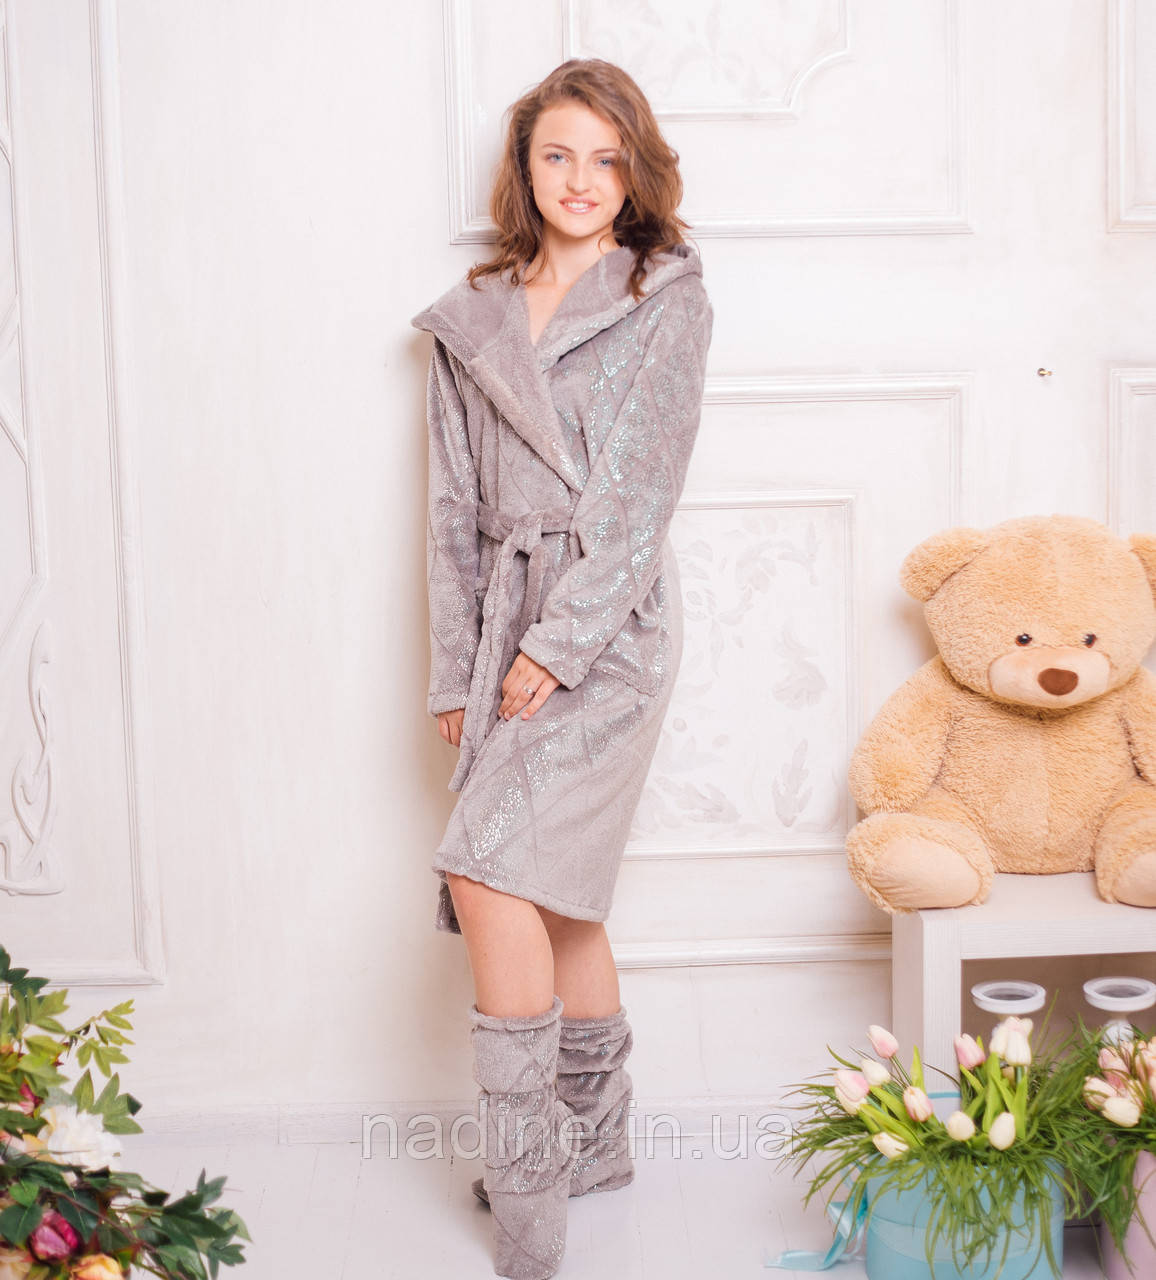 Блестящий халат Eirena Nadine (543-52) на рост 152 серый +сапожки